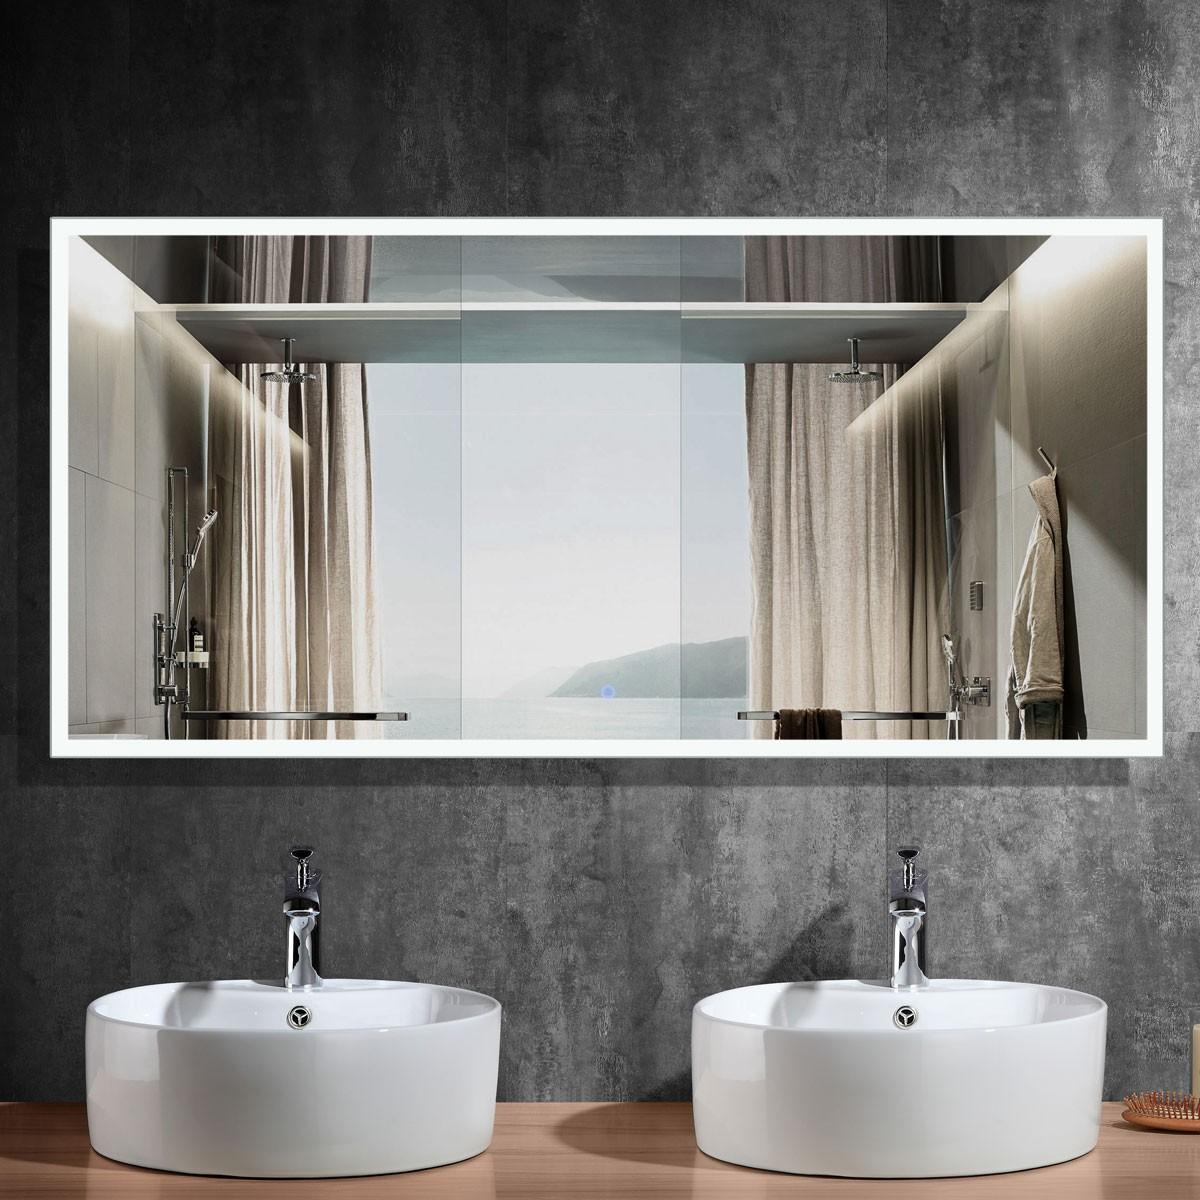 84 x 40 In Horizontal LED Bathroom Mirror, Touch Button (DK-OD-N031-A)